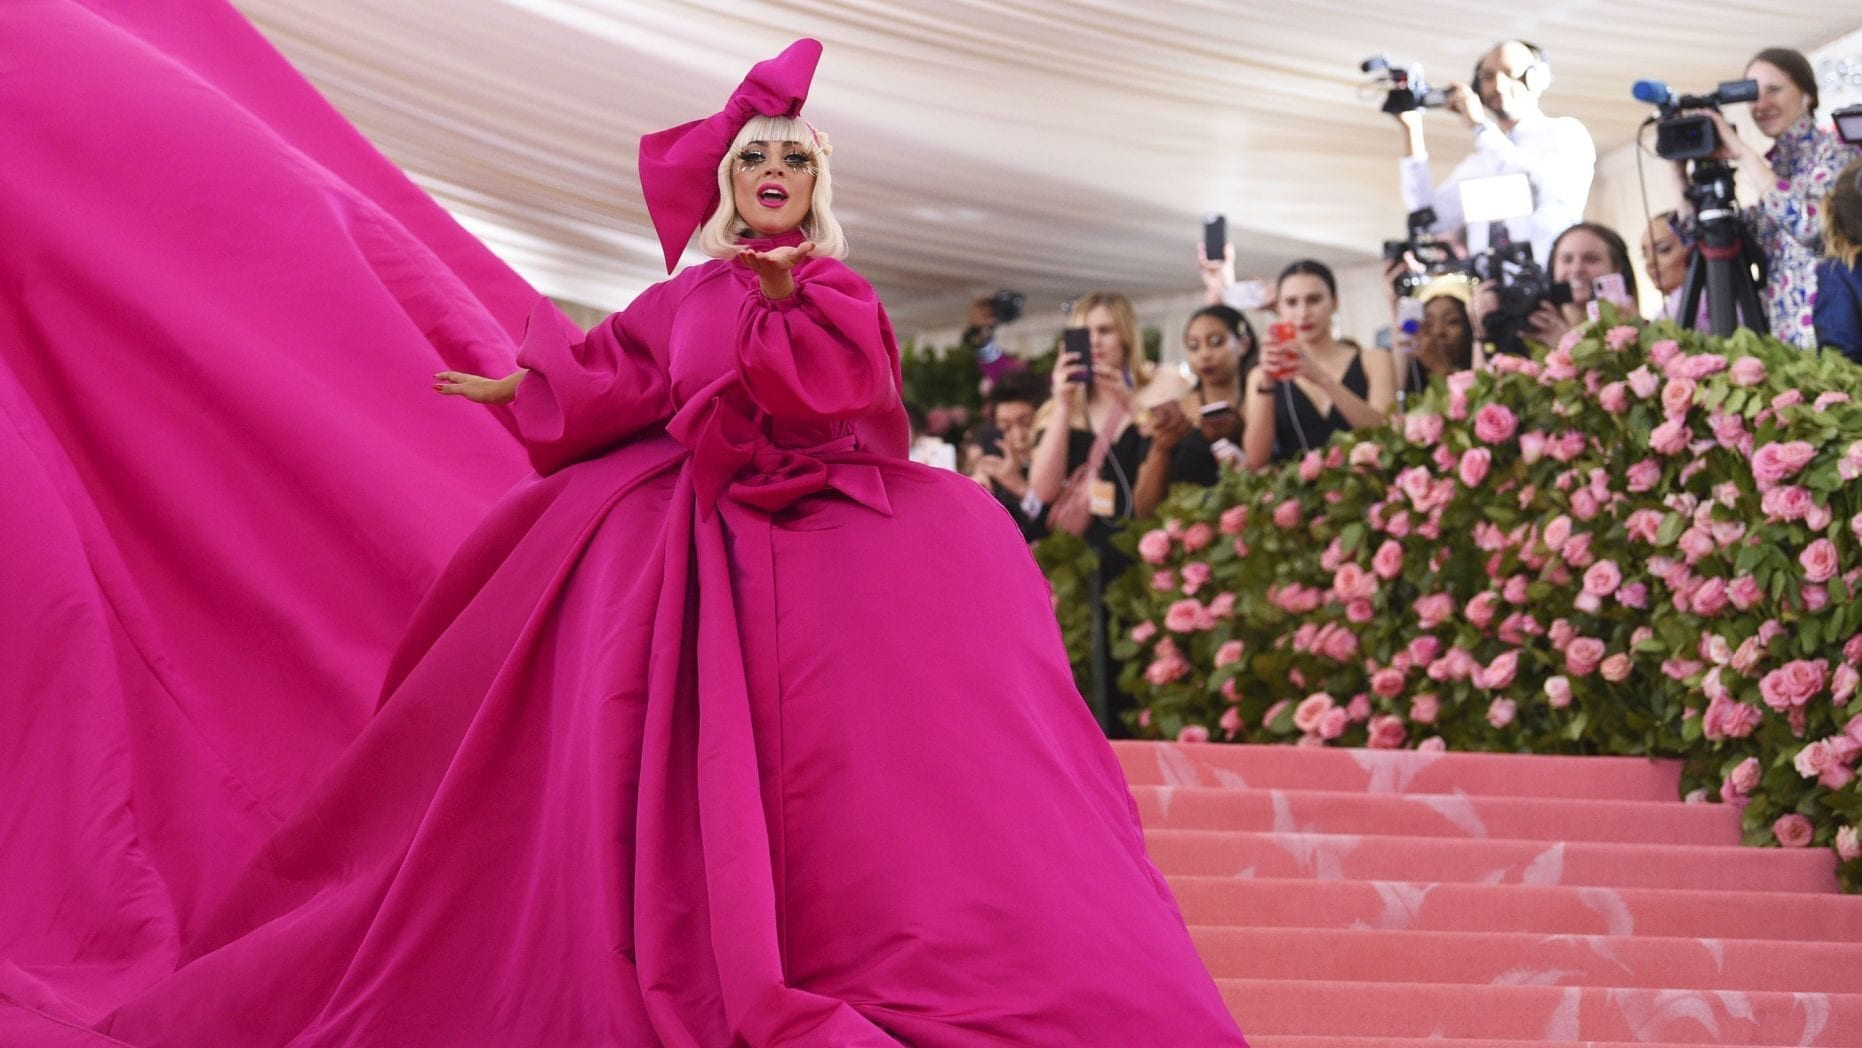 Lady Gaga's AMAZING entrance into the Met Gala 2019